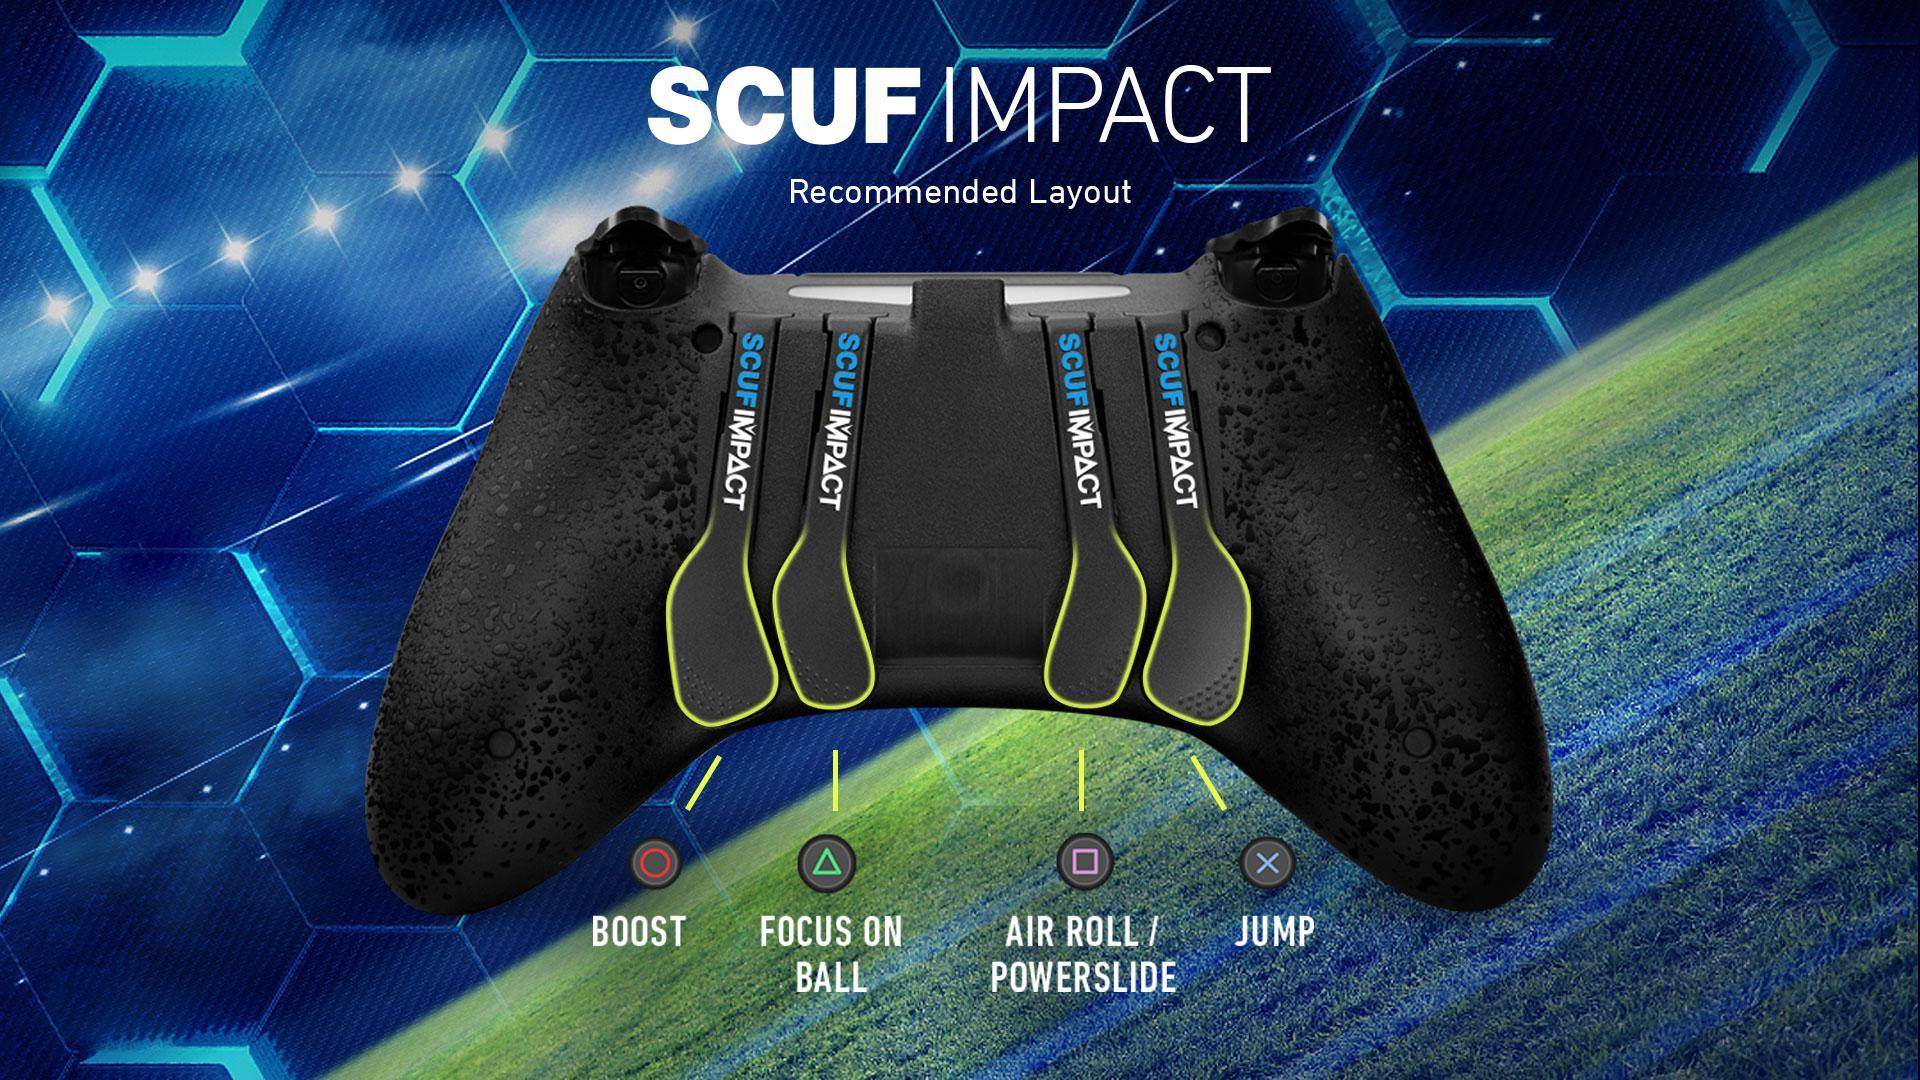 SCUF IMPACT Rocket League Controller Configuration